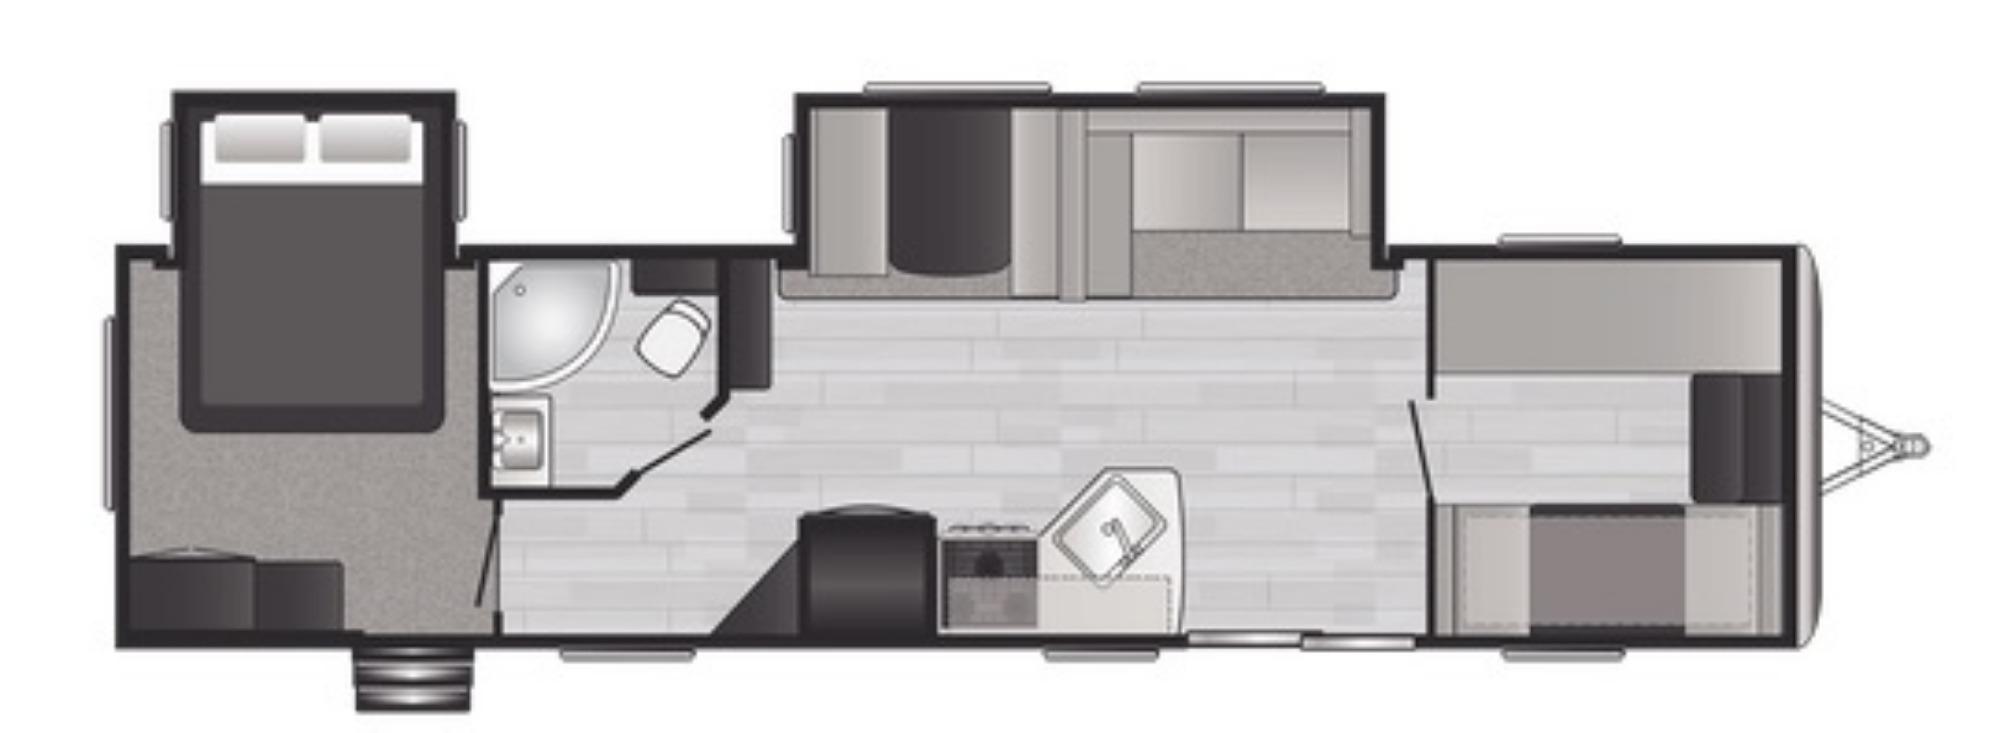 View Floor Plan for 2021 KEYSTONE SPRINGDALE 38BH